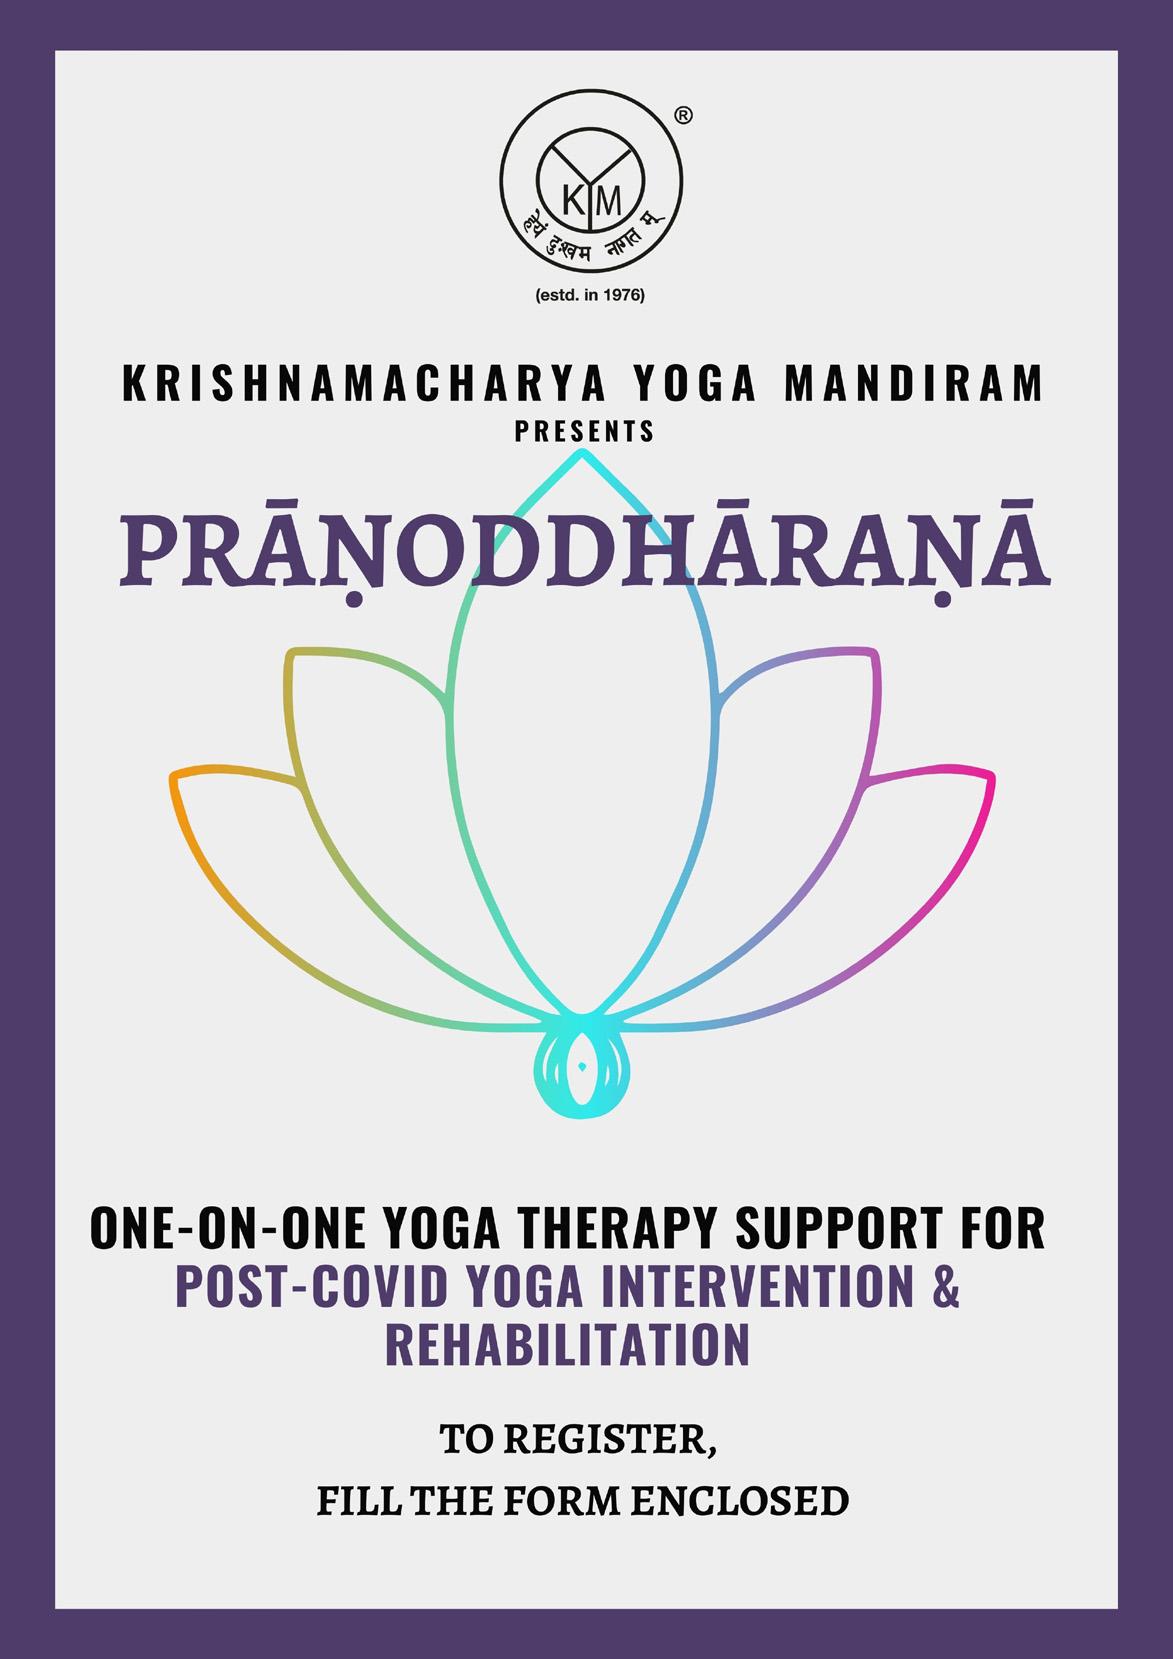 Post-Covid Rehabilitation Through One-on-One Yoga Therapy | Prāṇoddhāraṇa